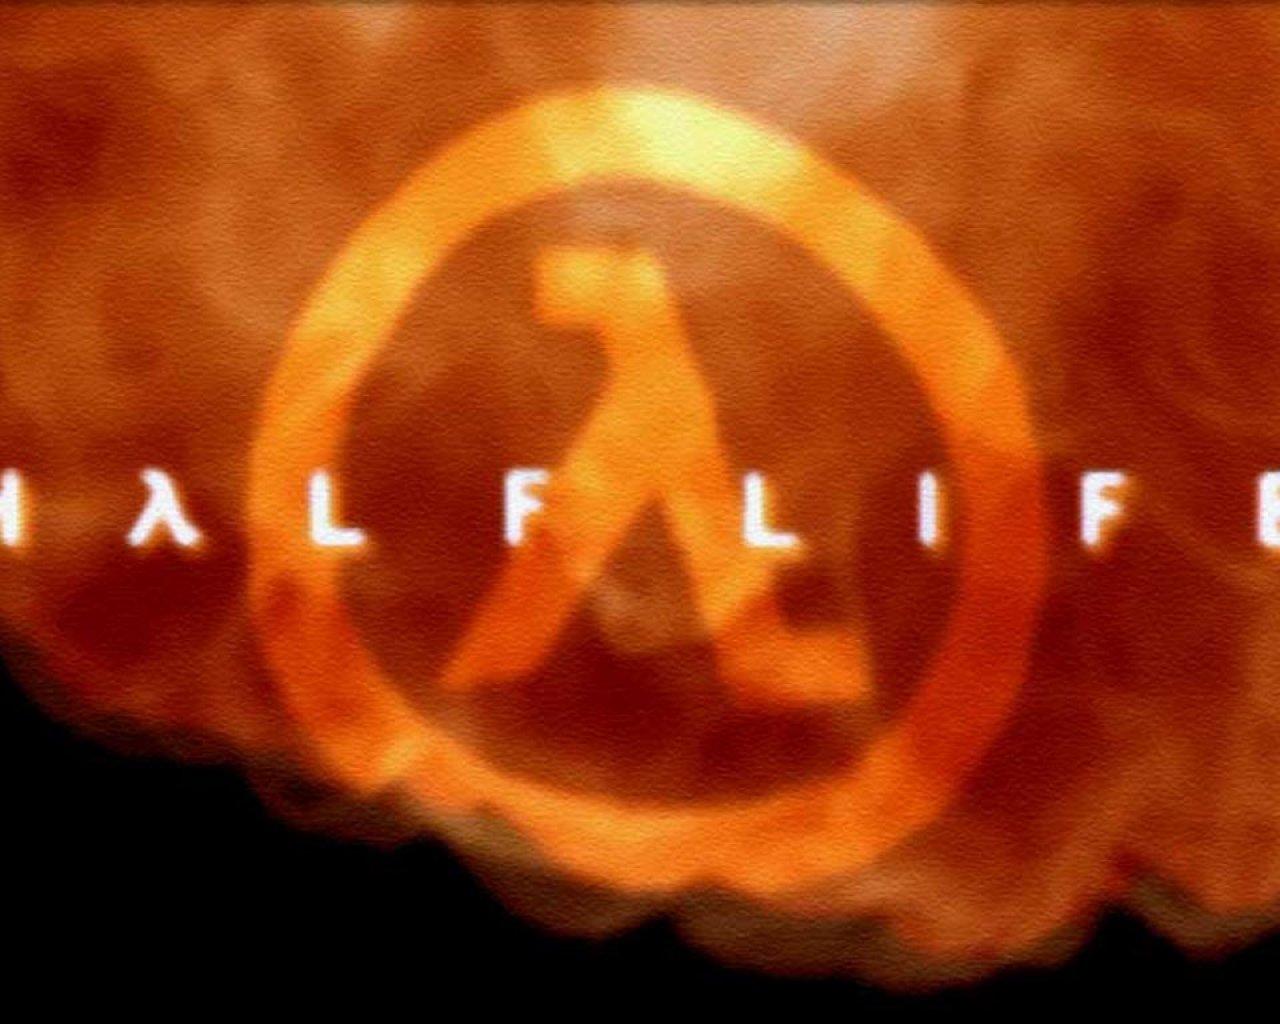 Games Half life Wallpapers